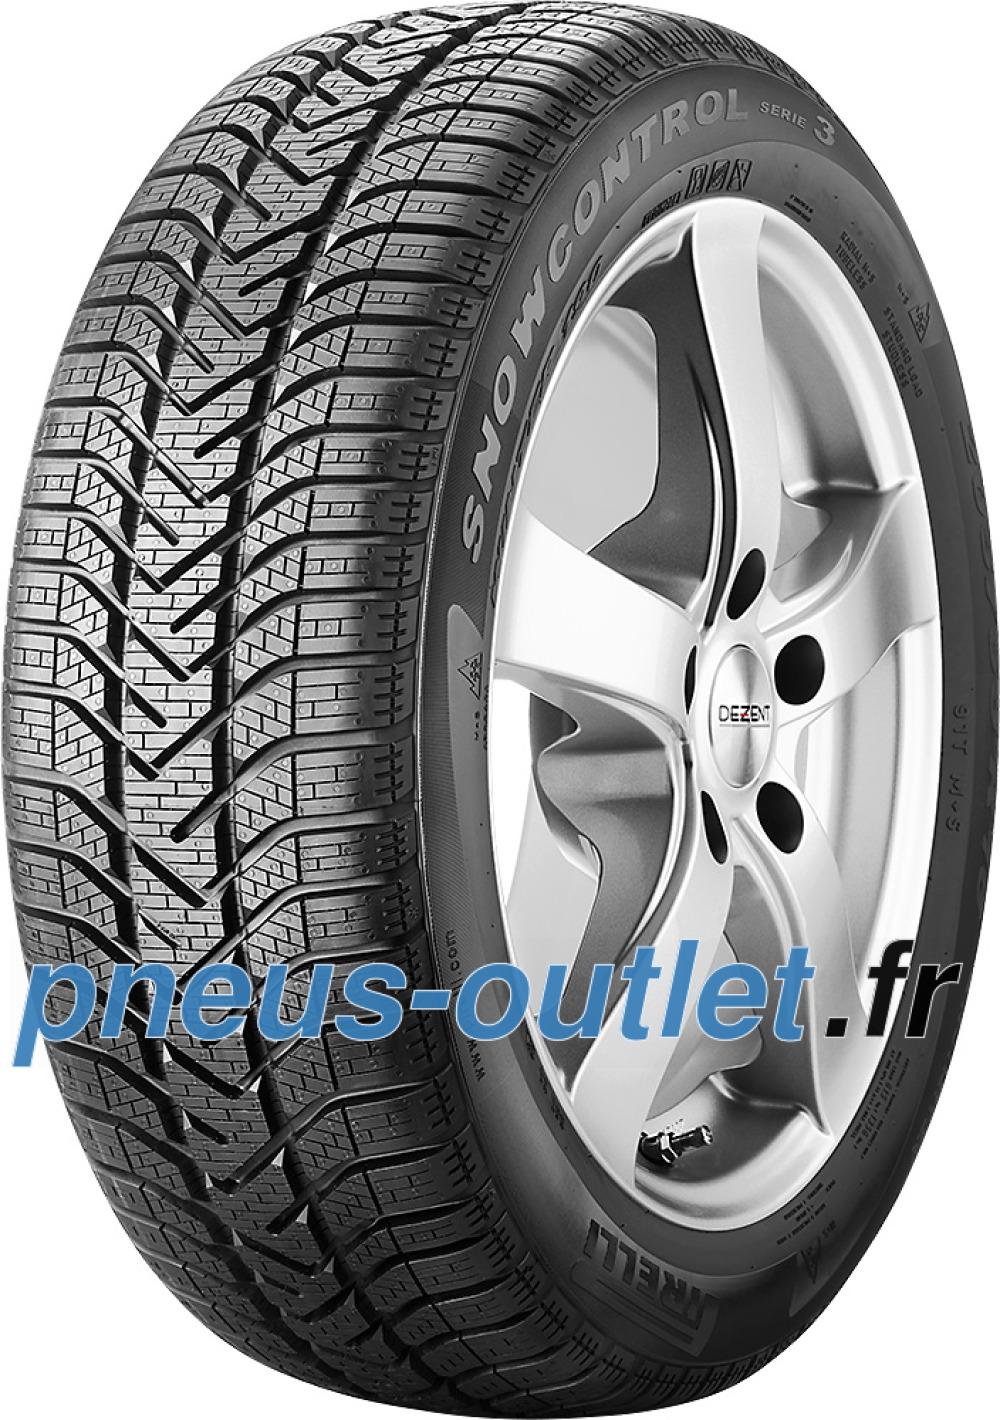 Pirelli W 190 Snowcontrol Serie III ( 195/65 R15 95T XL ECOIMPACT )